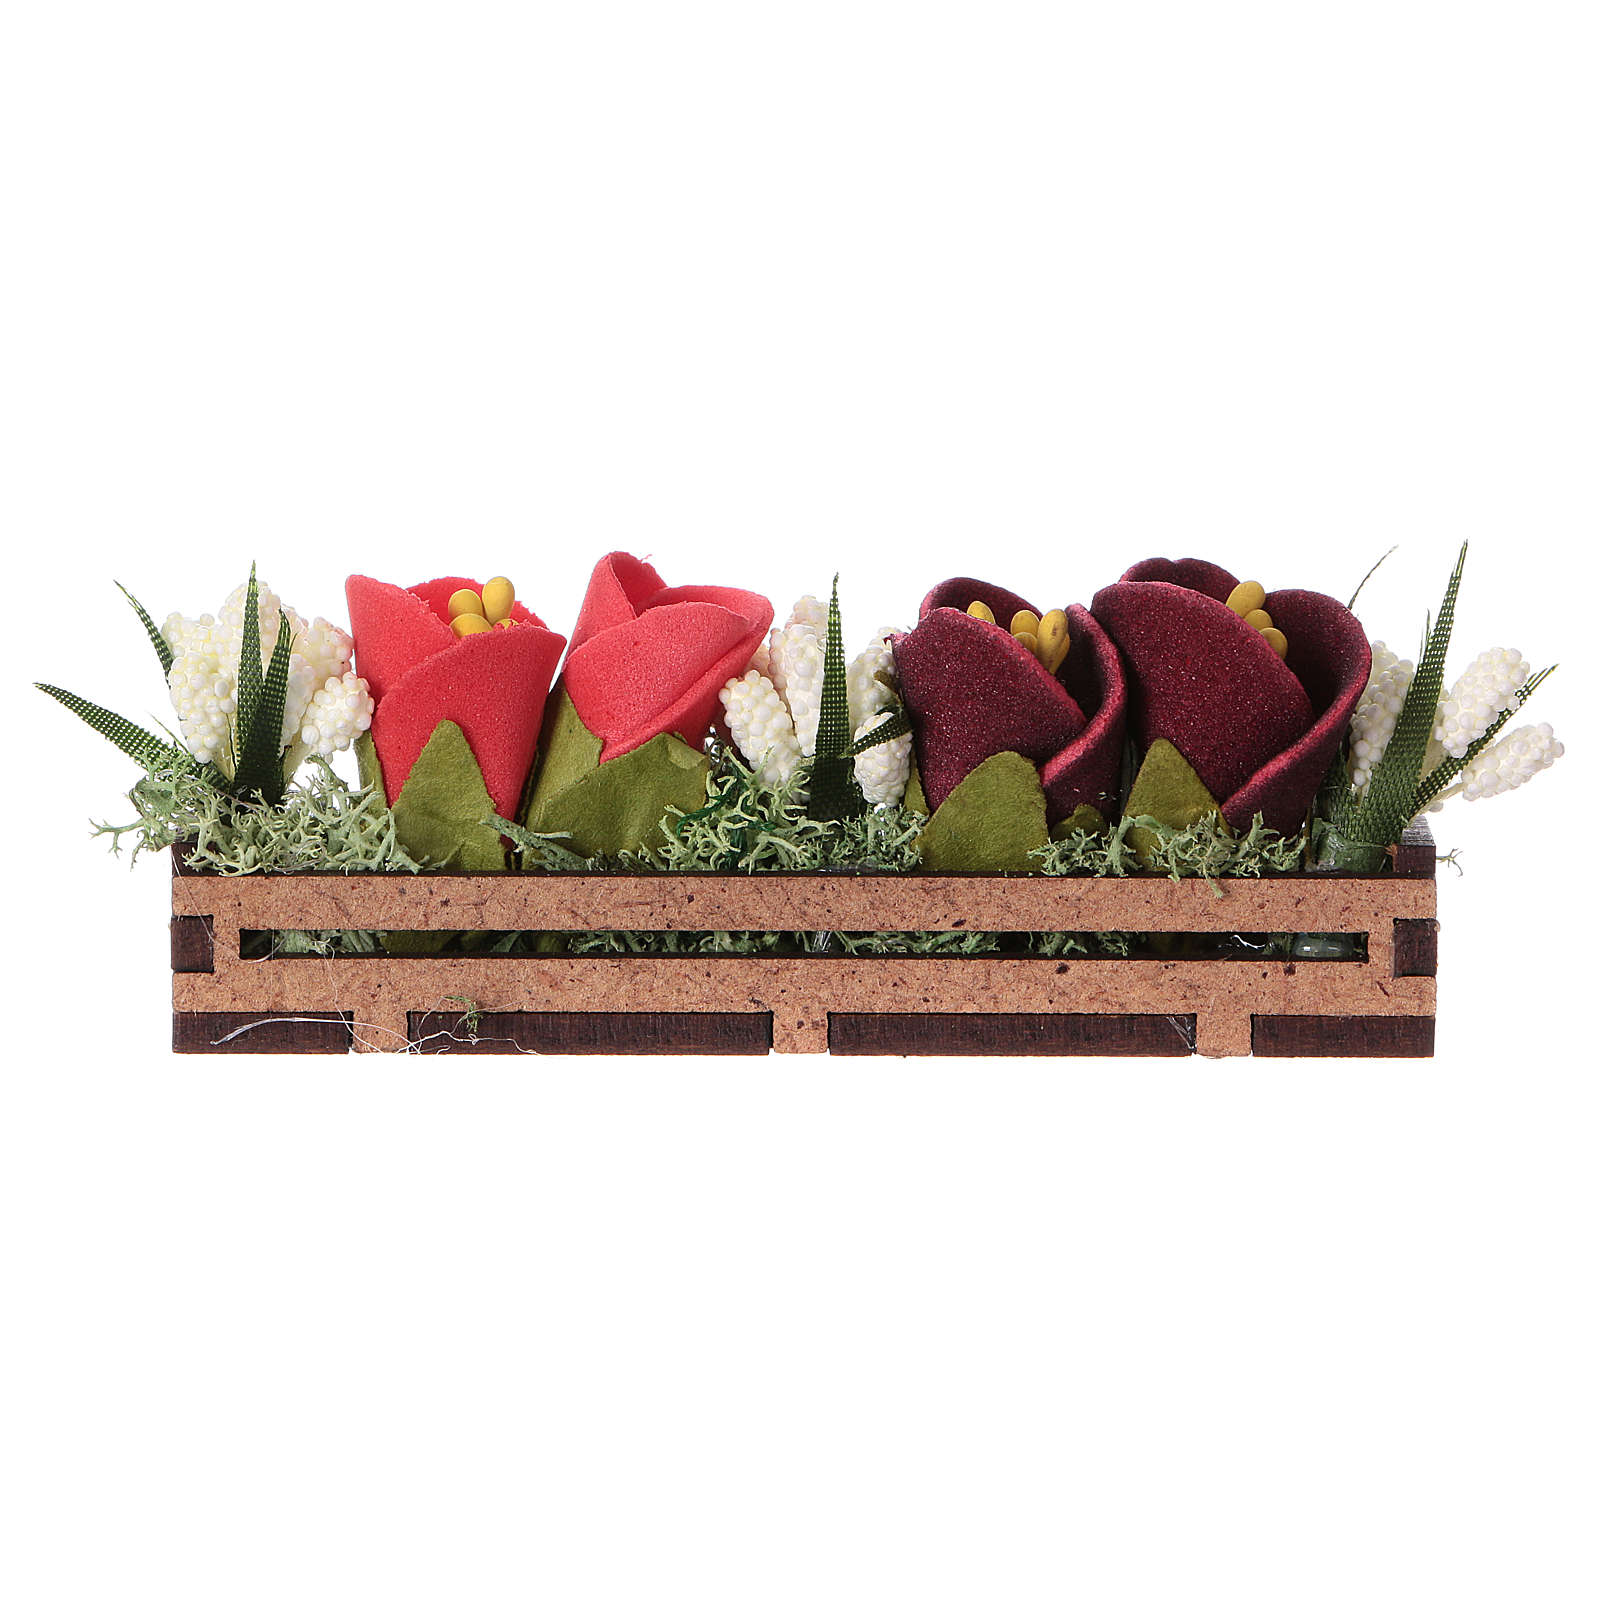 Wooden planter 5x10x5 cm 4